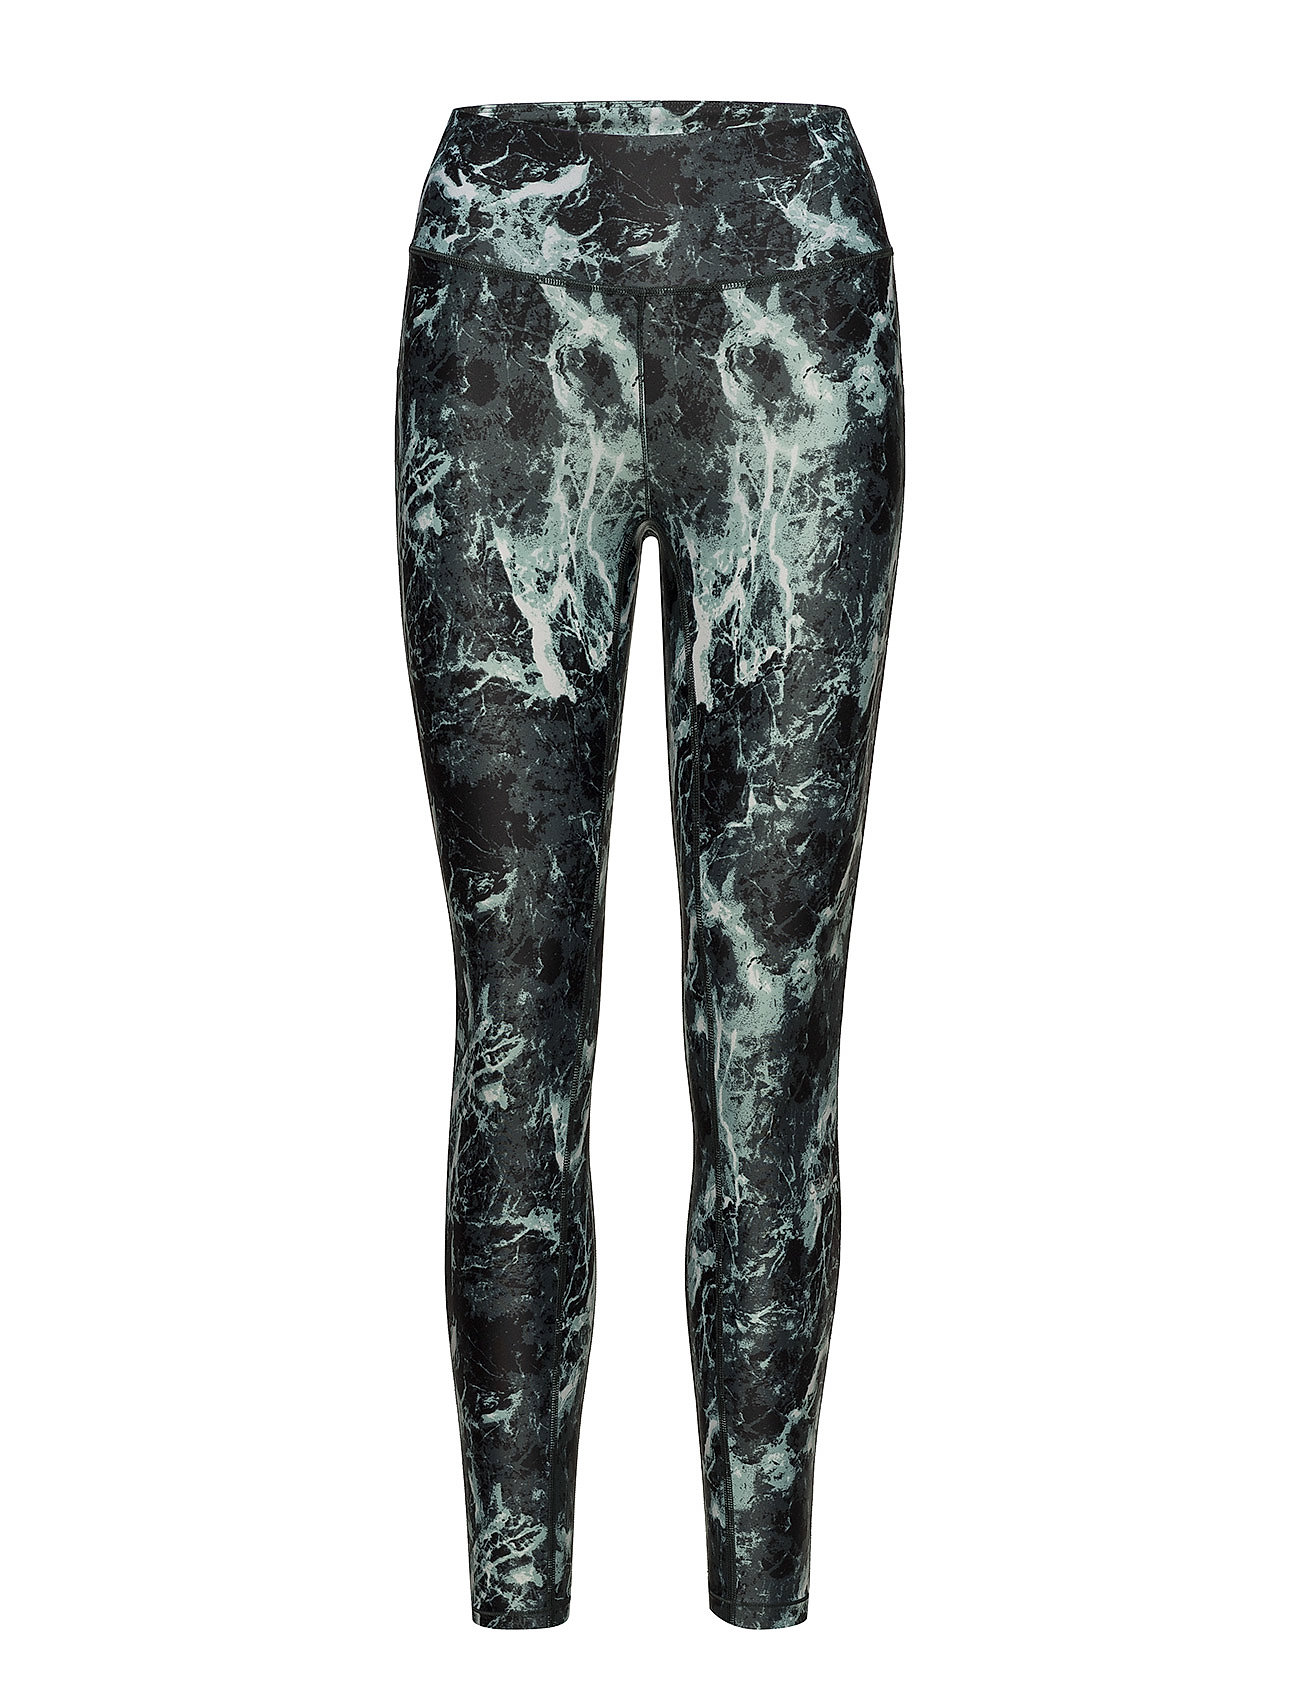 Casall Stone print 7/8 tights - STONE